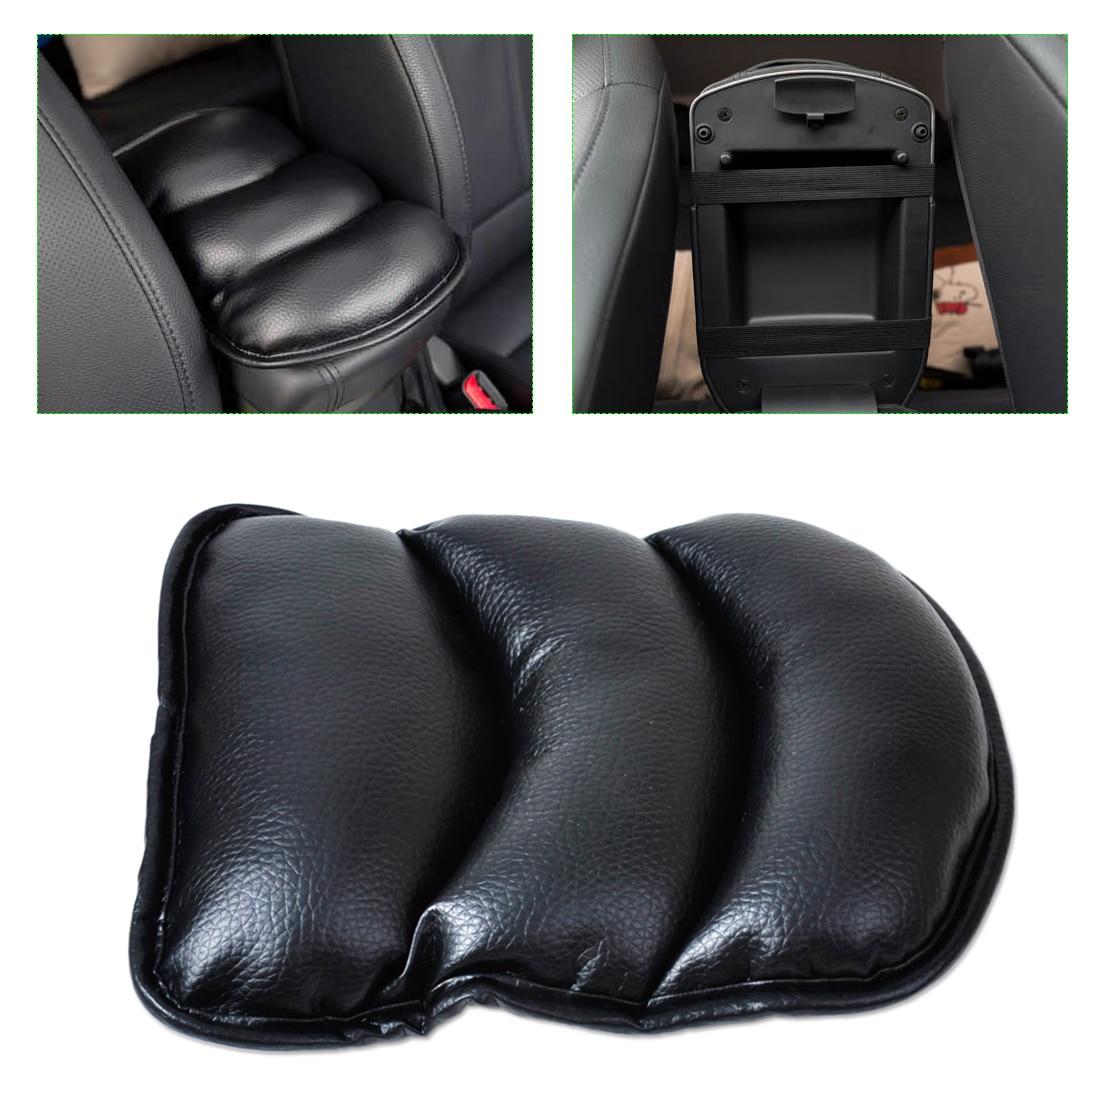 Car Center Armrest Console Soft Cushion PU Leather Mat Cover Cushion Pad Black